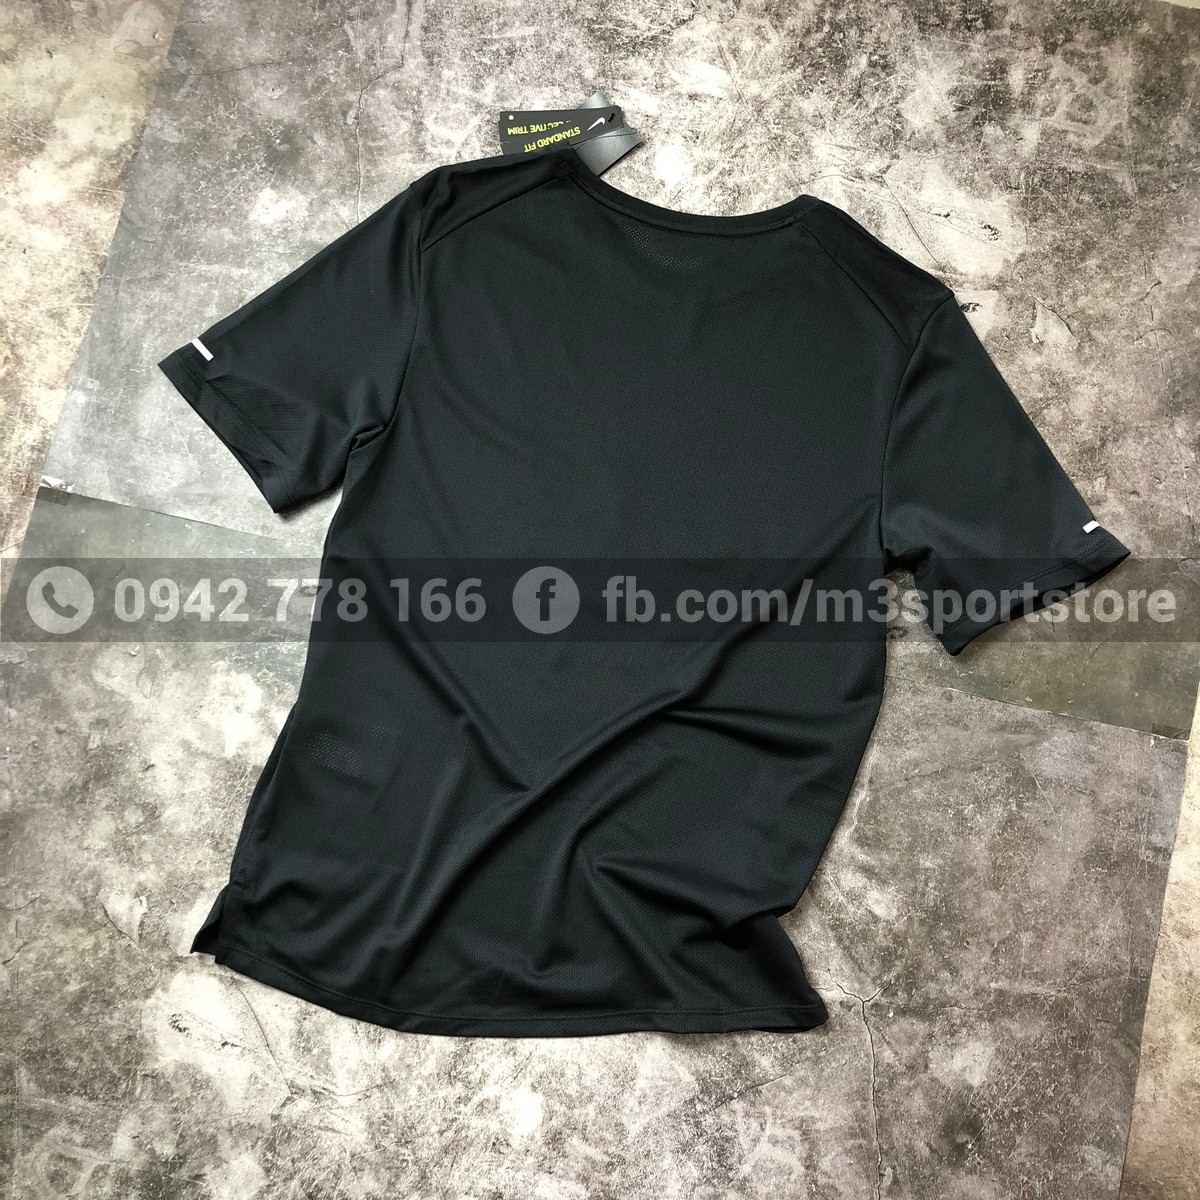 Áo thể thao nam Nike Dri-FIT Miler Wild Run DA0217-010